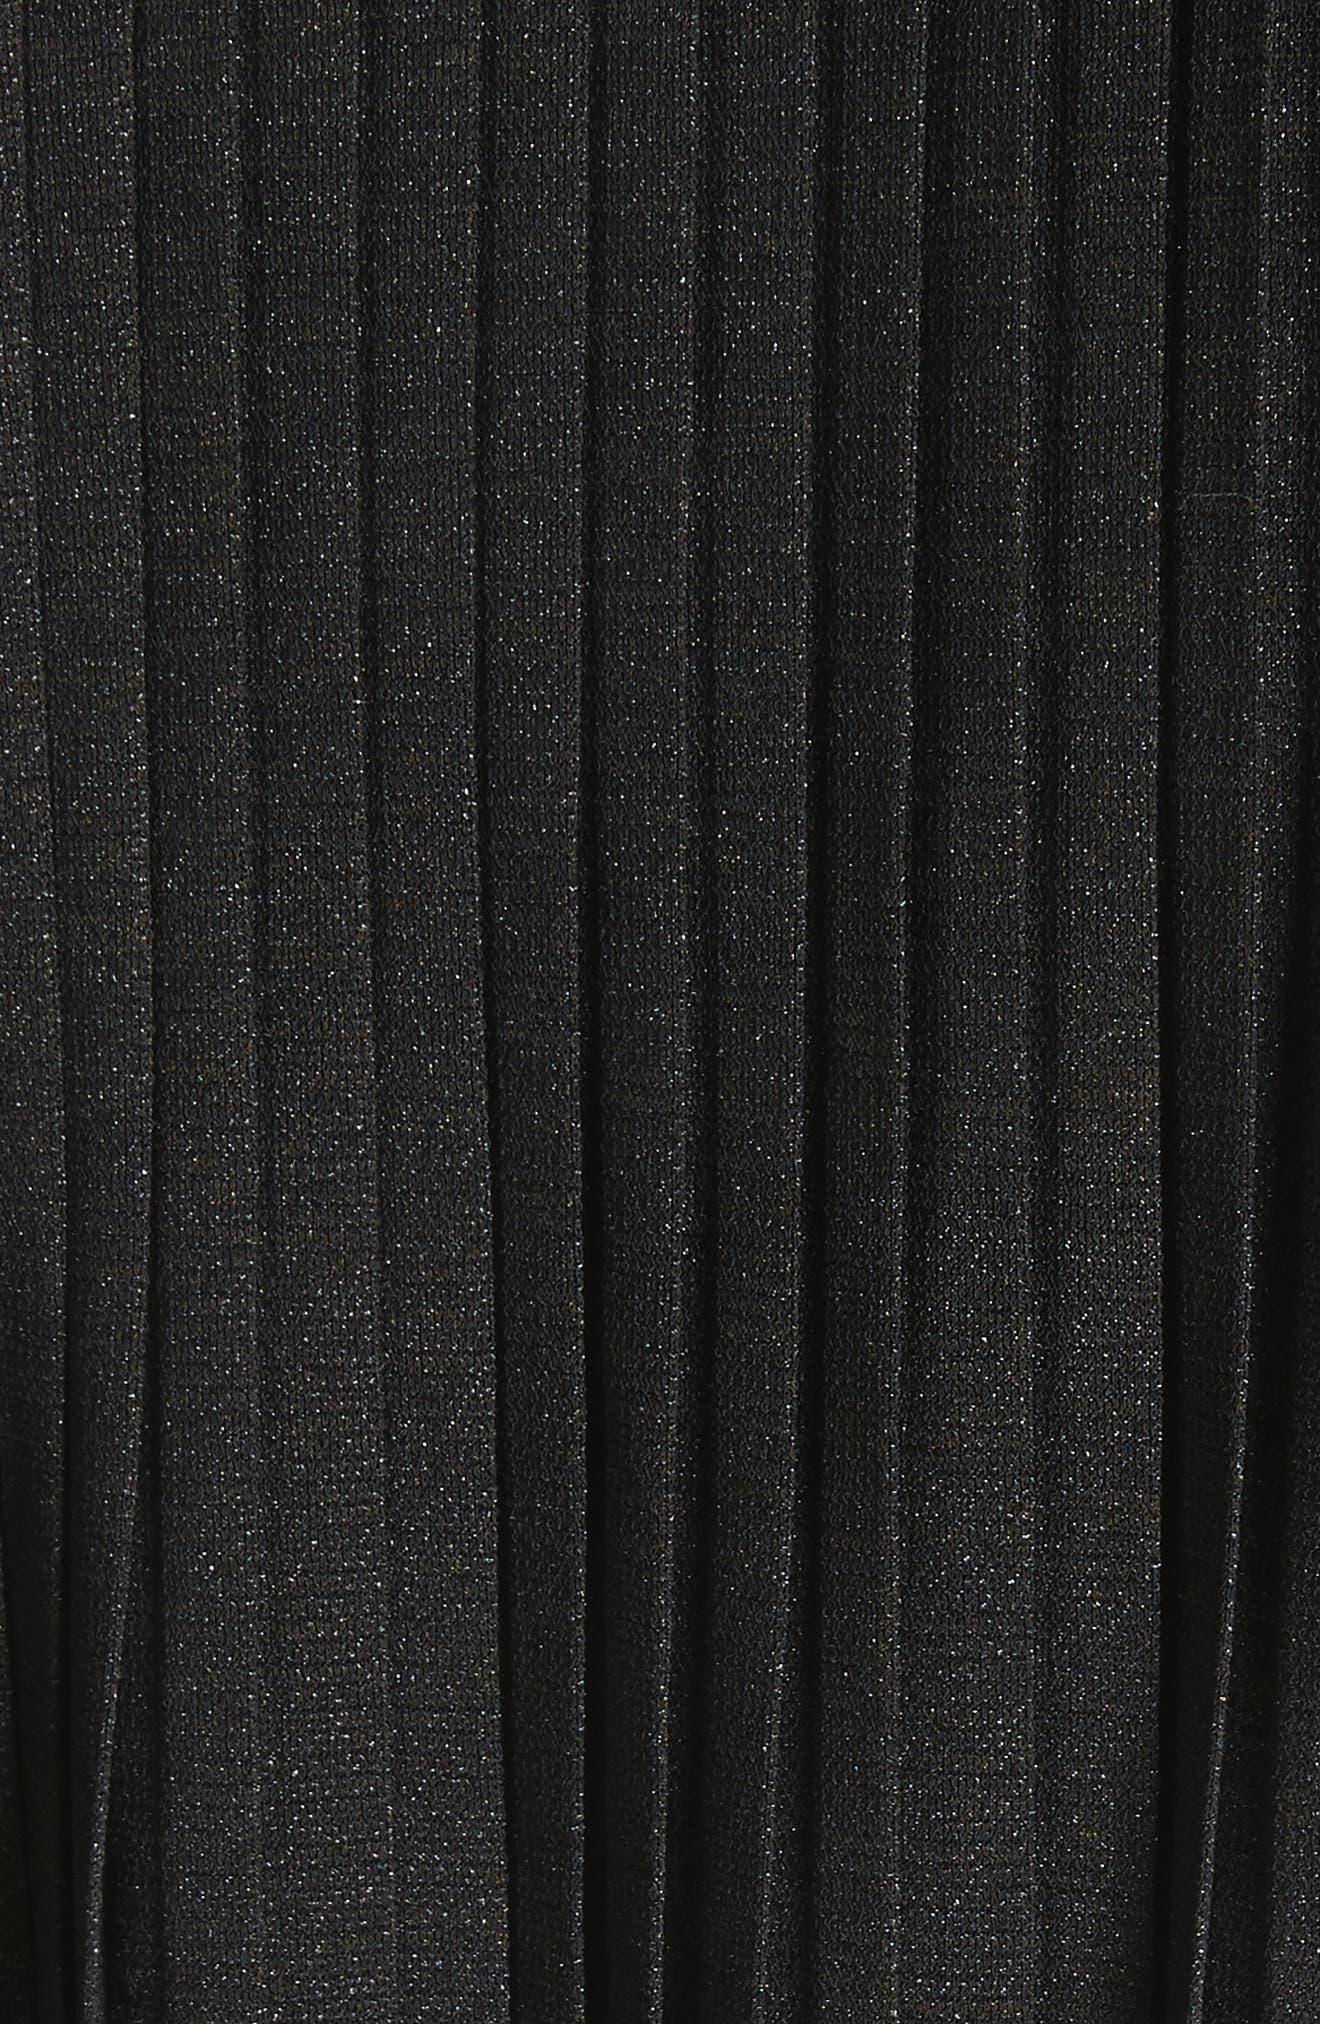 Slit Sleeve Peasant Top,                             Alternate thumbnail 5, color,                             001